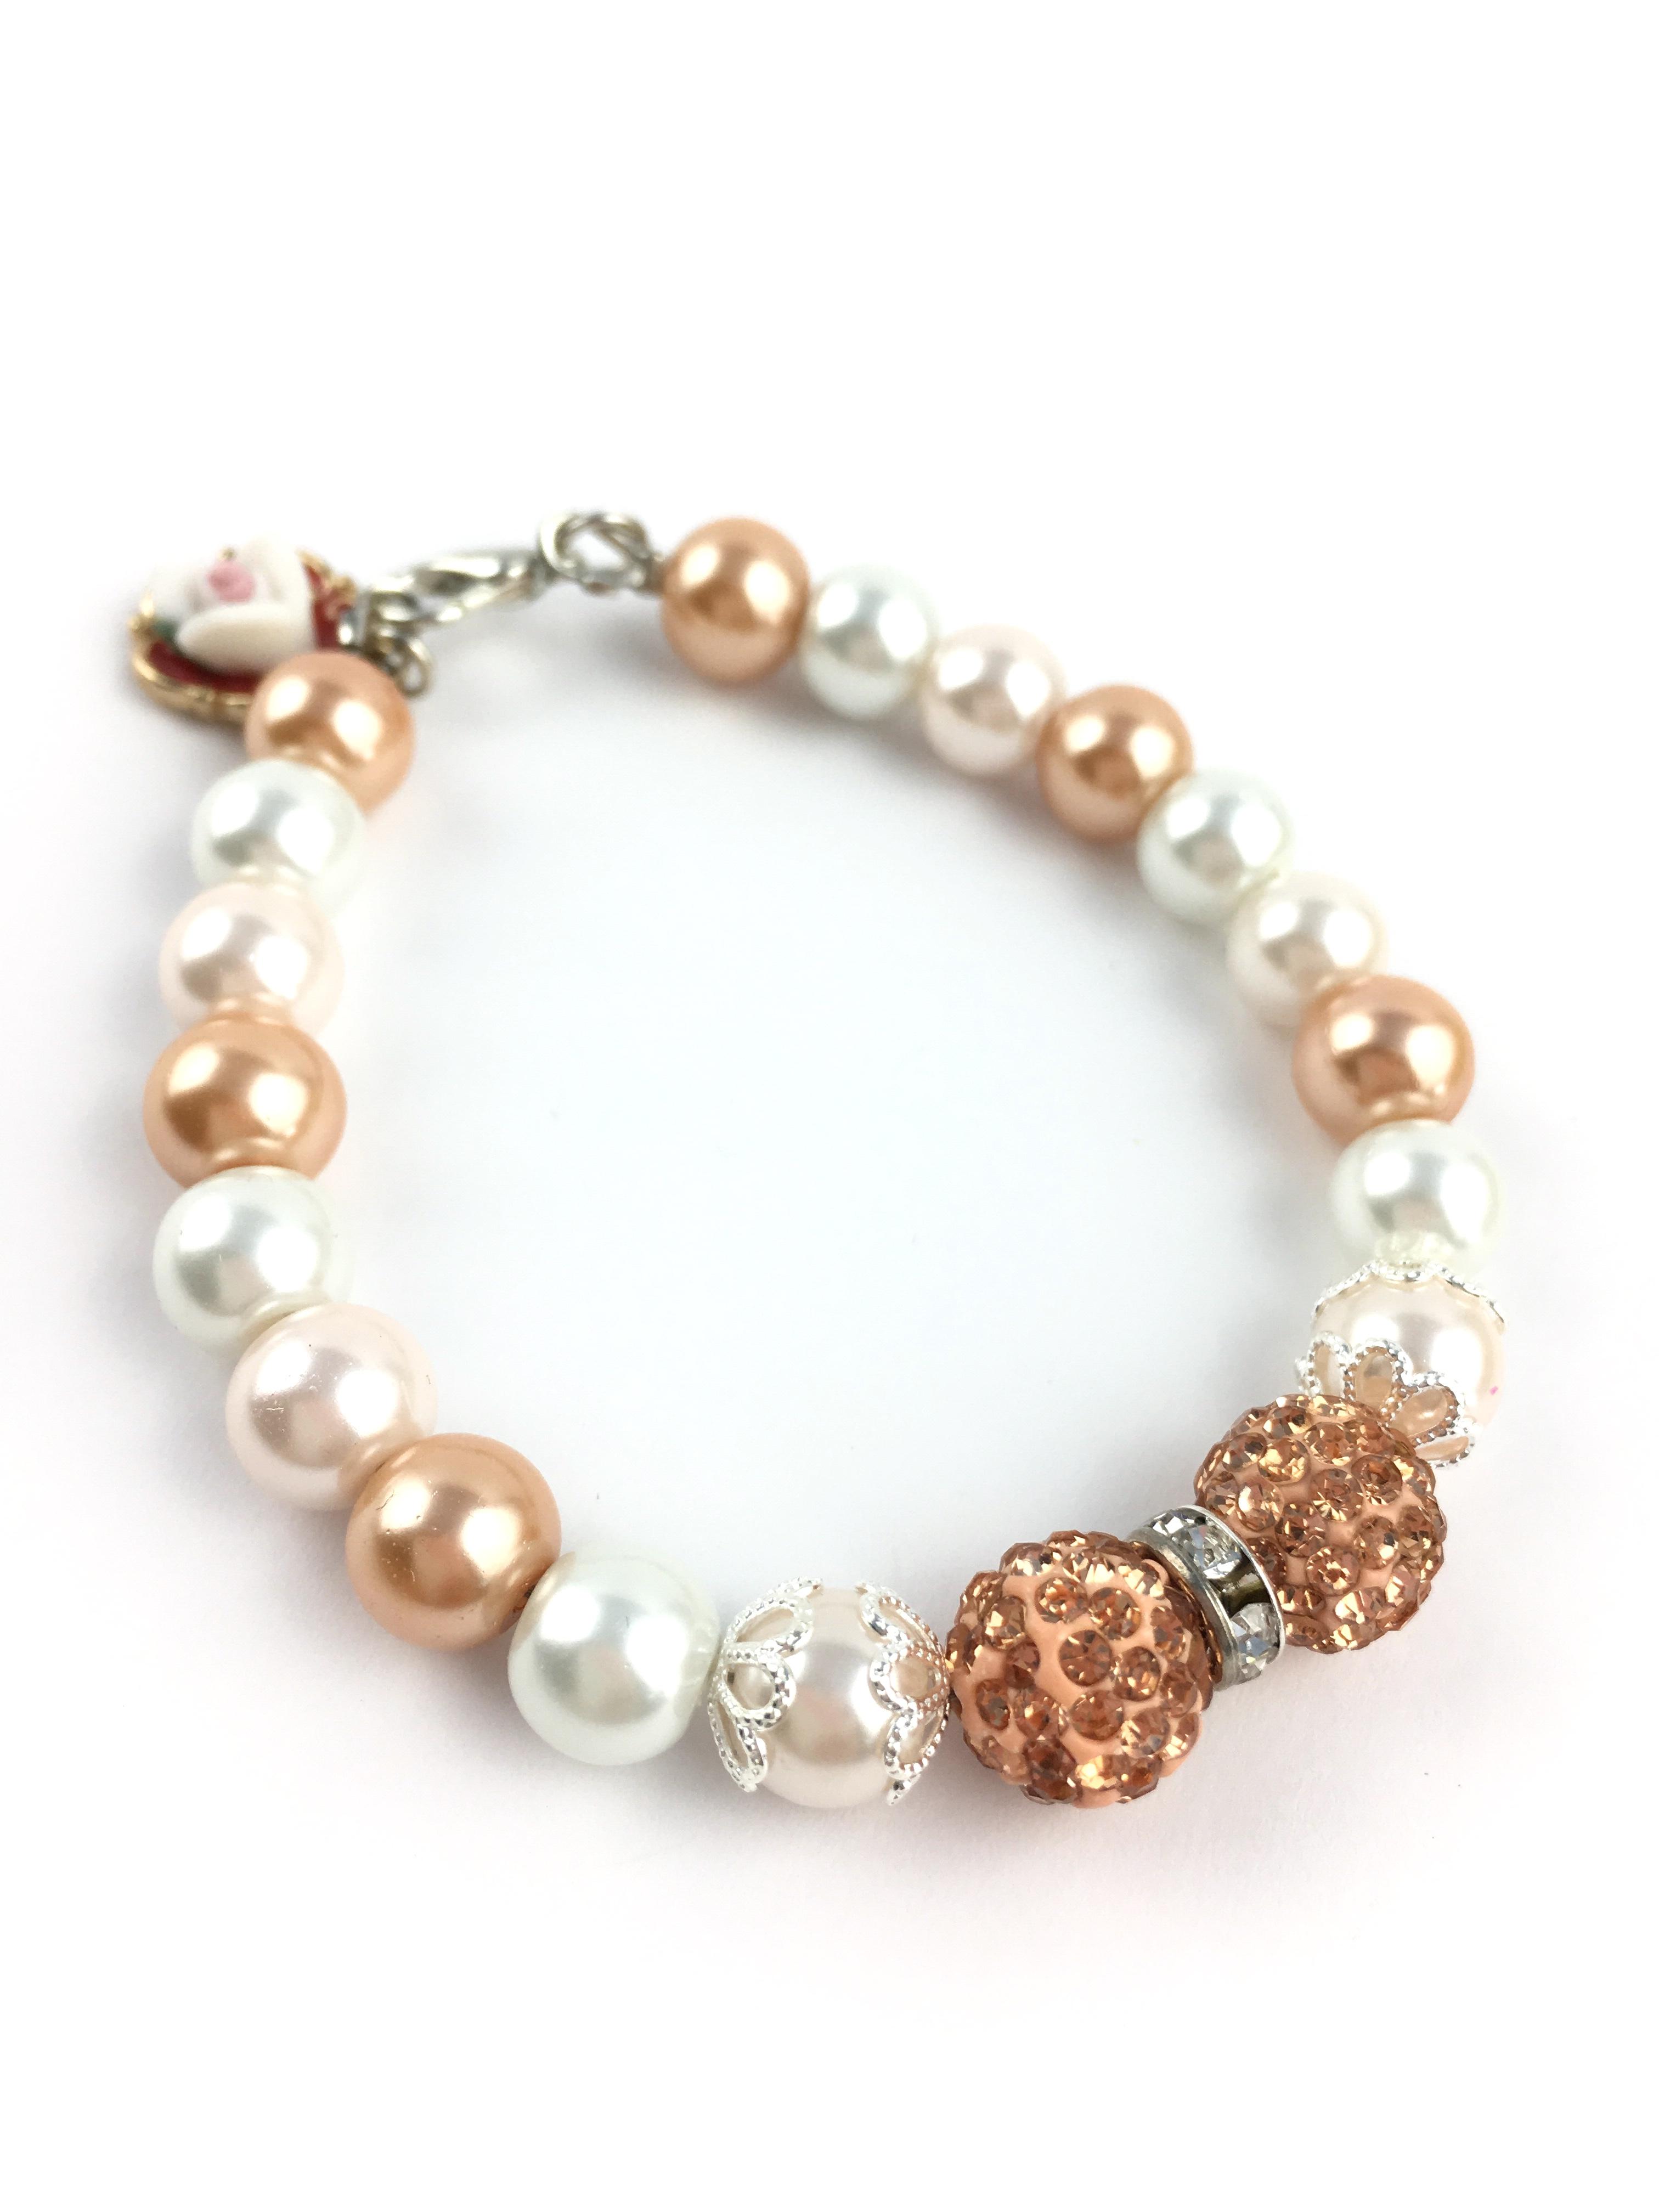 Handmade Bridesmaid Bracelet with Rhinestone Beads and Flower Charm